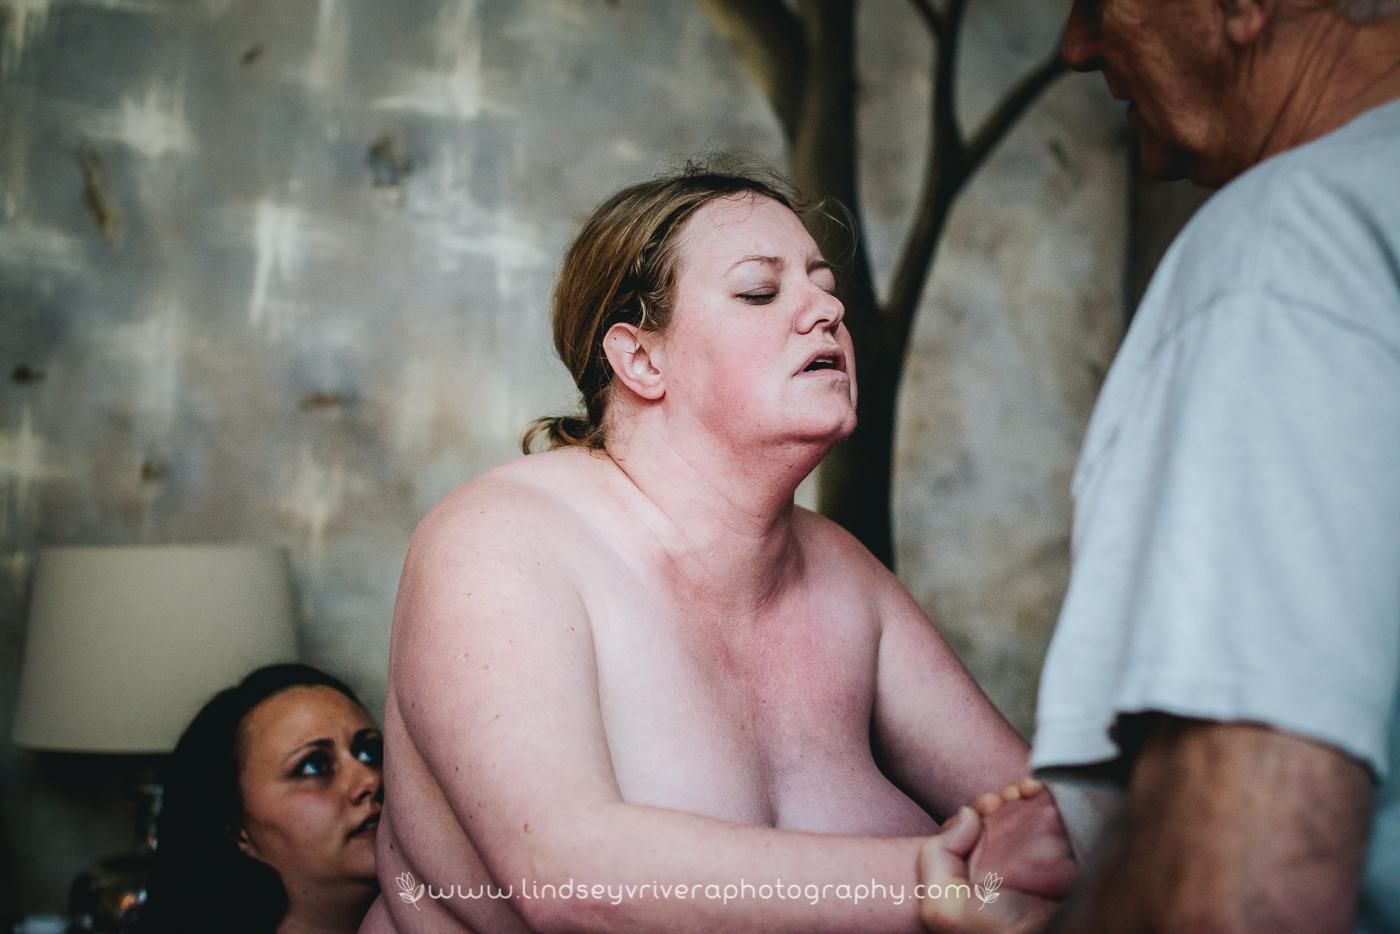 Home-Birth-Born-Photography-Salt-Lake-City,-Wasatch-Midwifery-&-Wellness,-Just-Born5.jpg